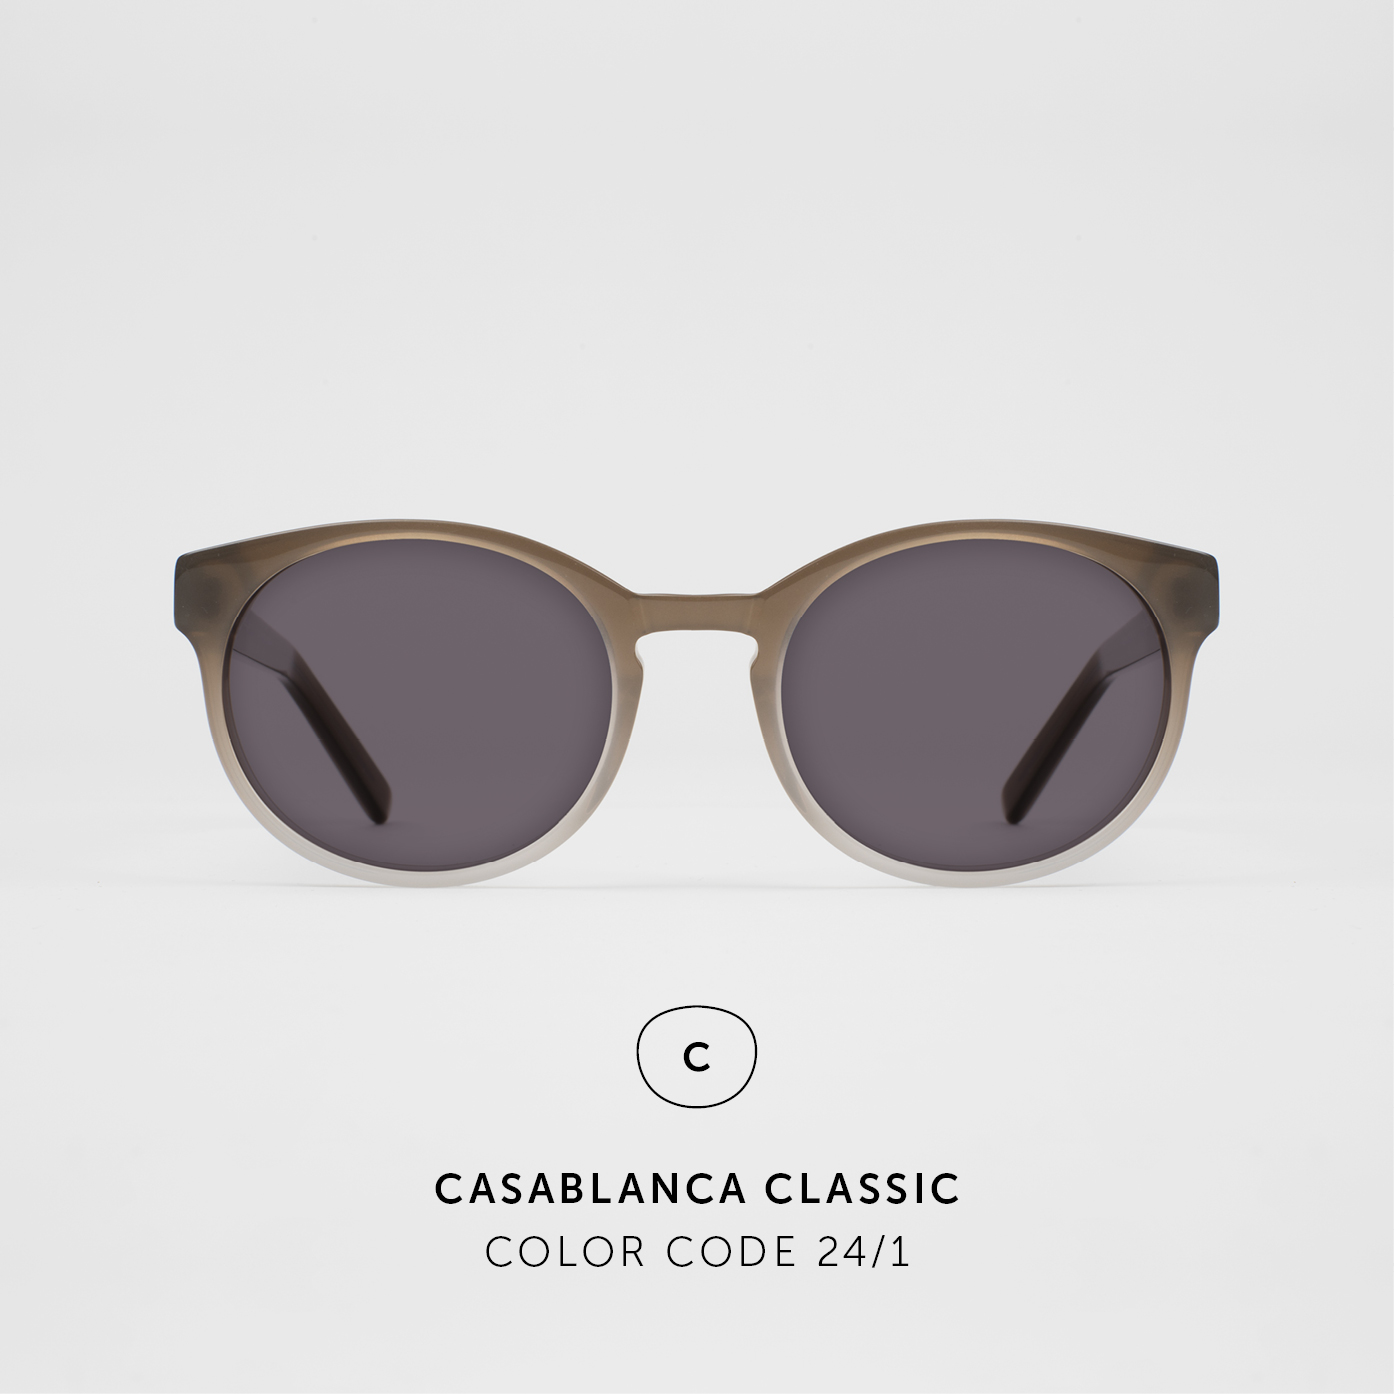 CasablancaClassic58.jpg